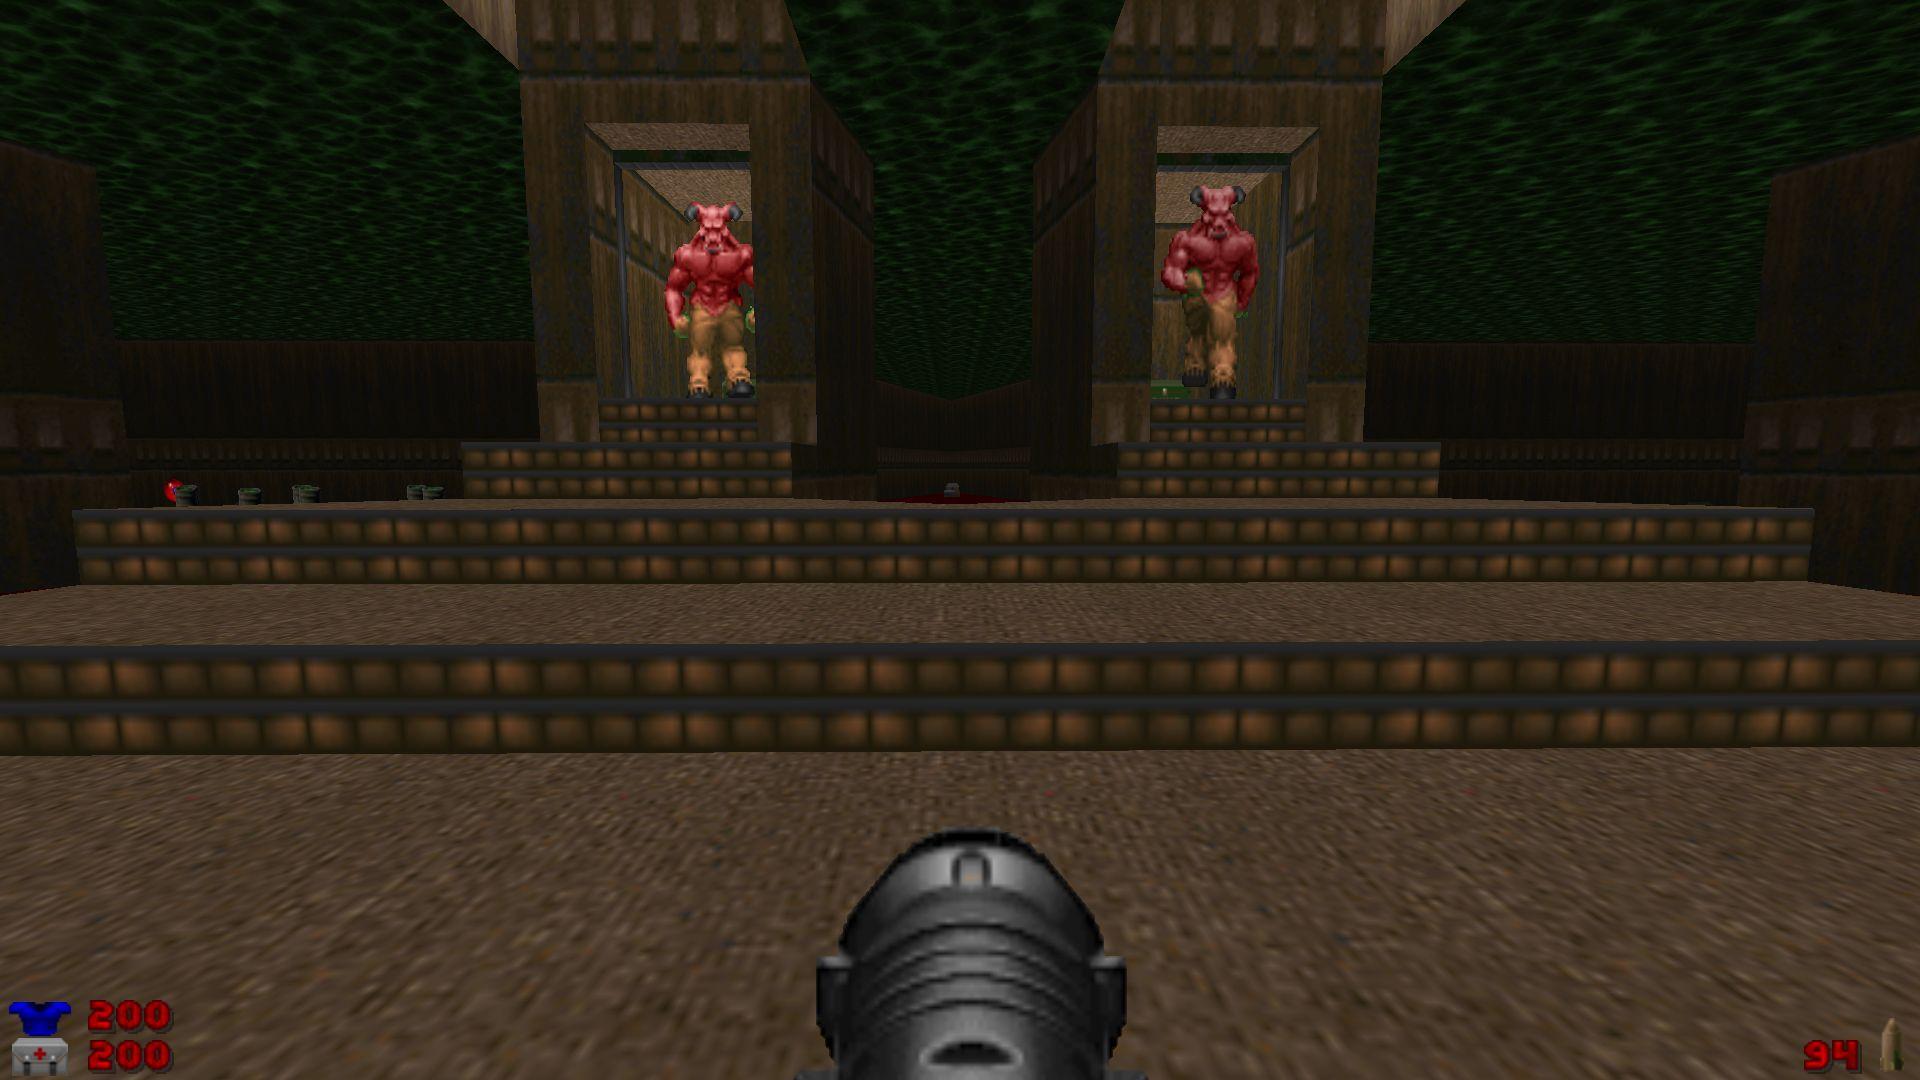 Doom E1M8: Barons of Hell, aka the Bruiser Brothers.